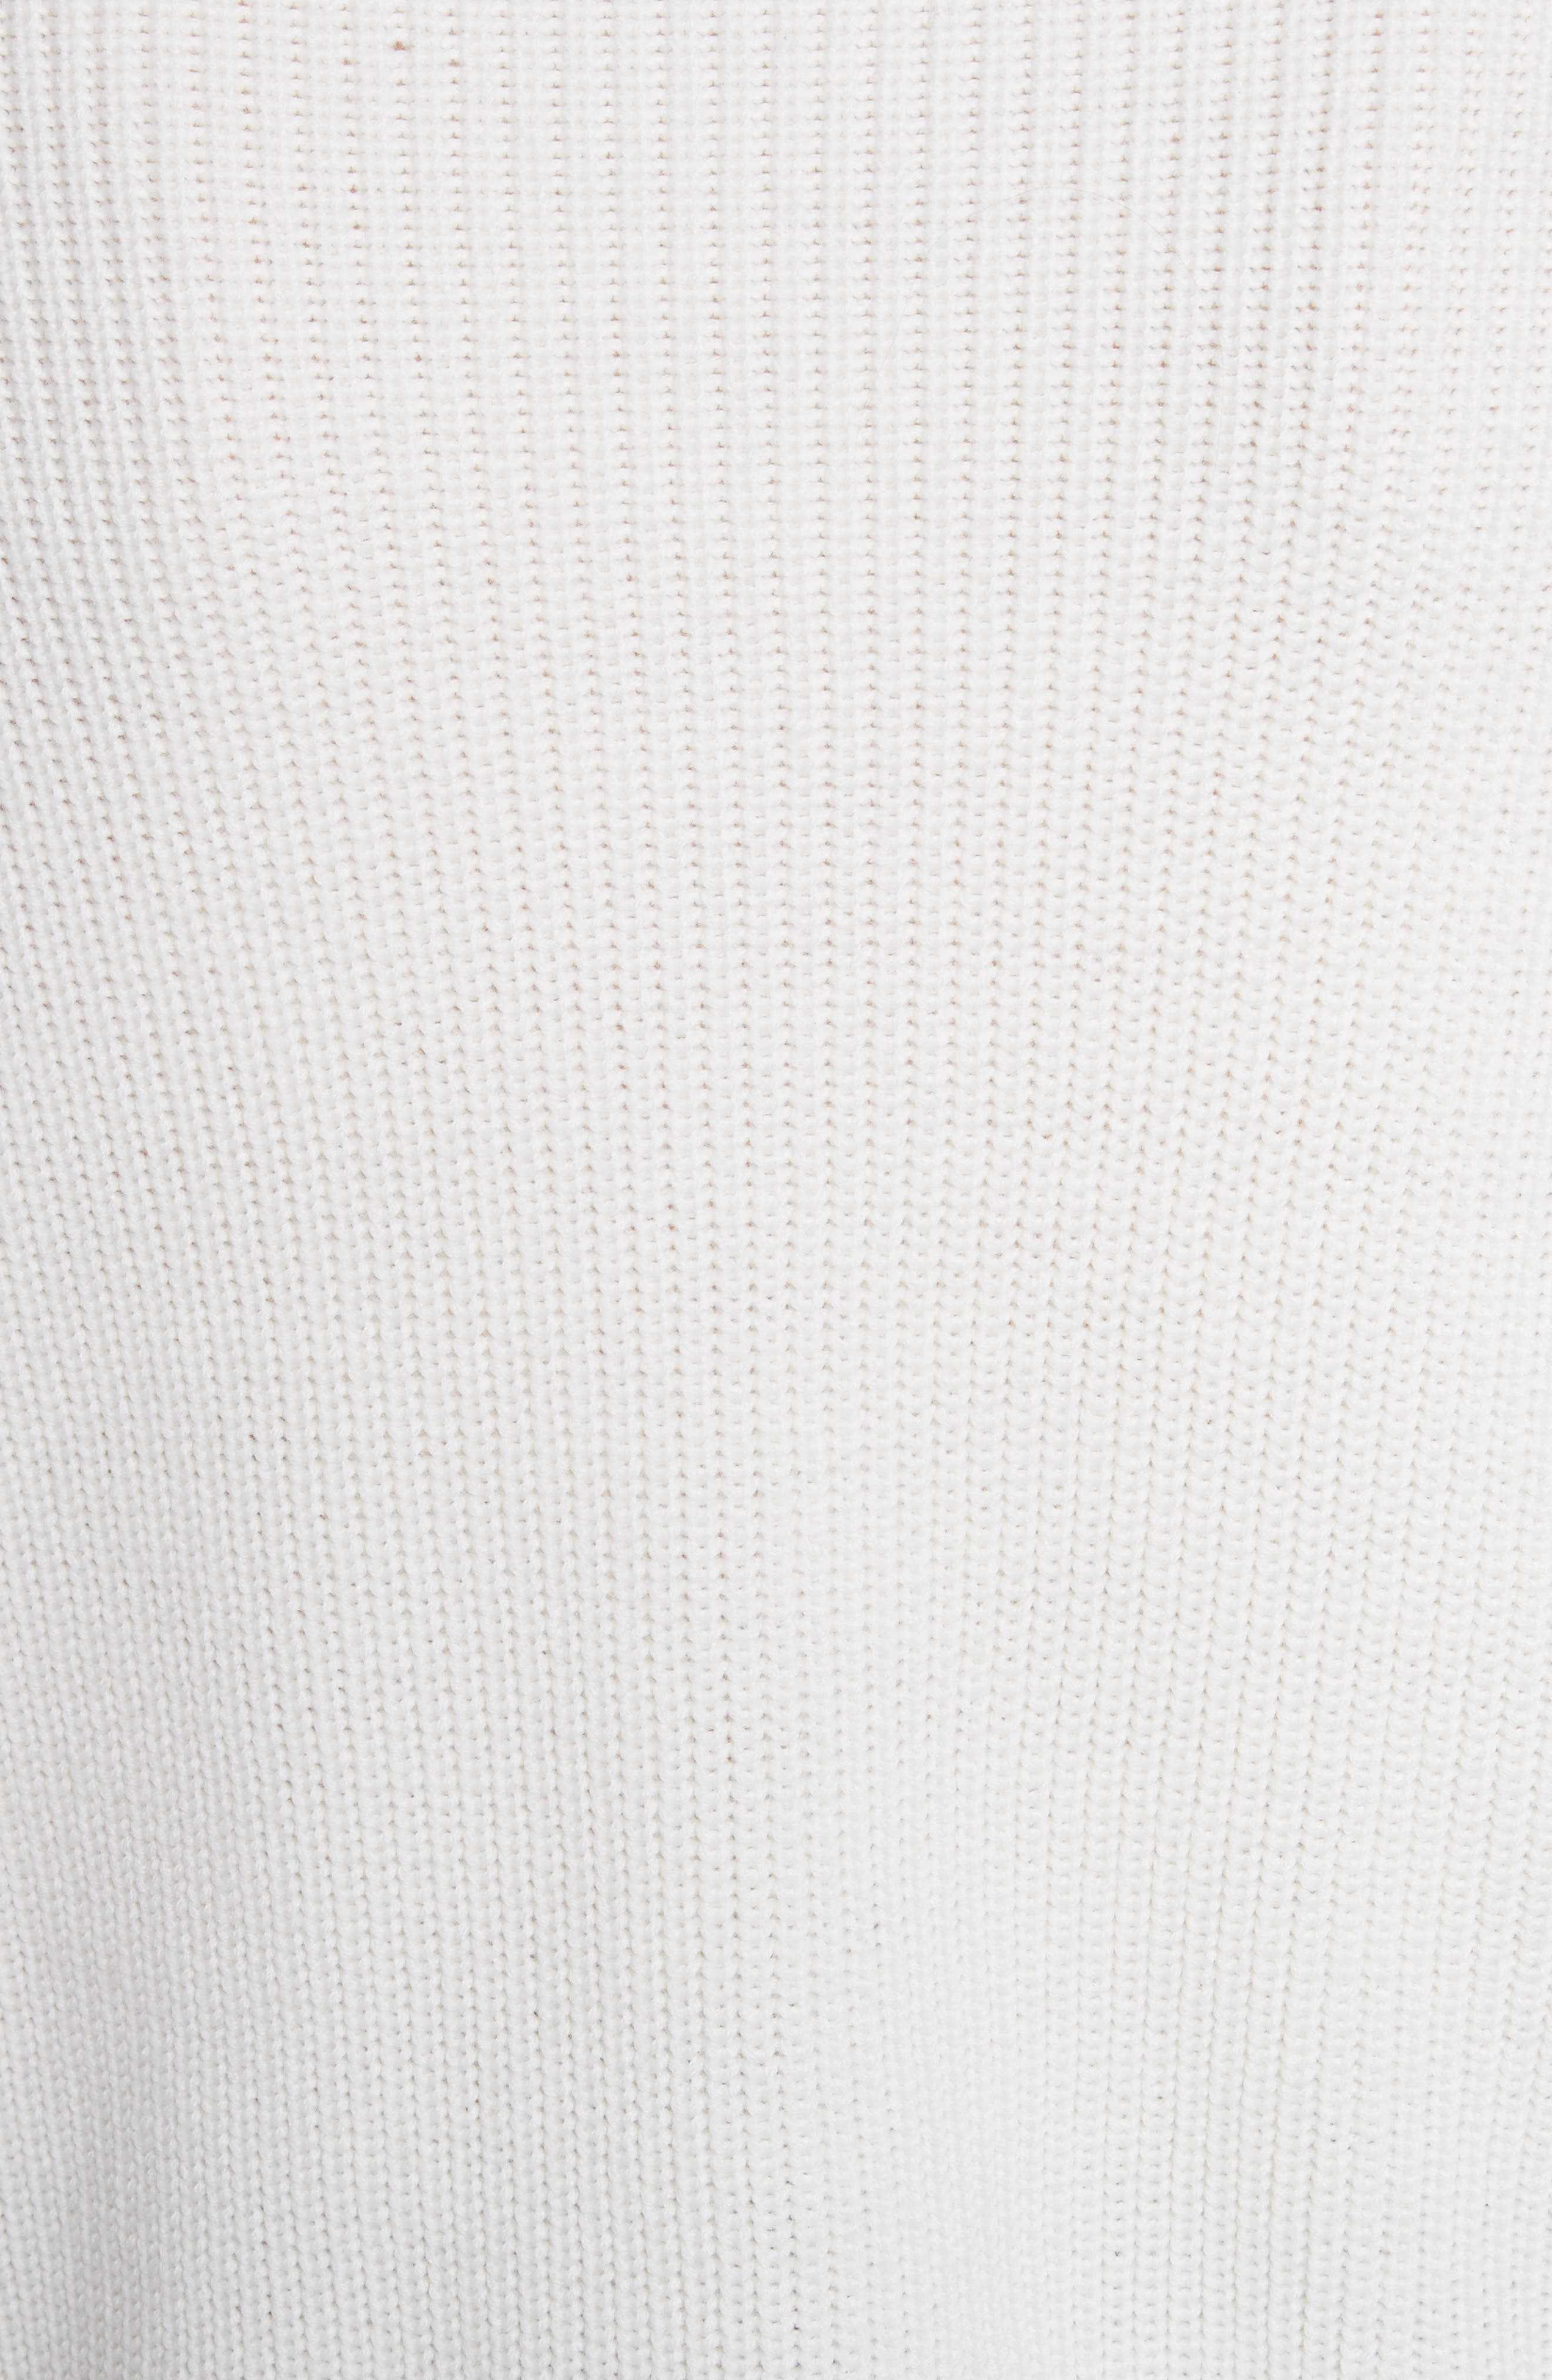 Tori Cutout Sweatshirt,                             Alternate thumbnail 5, color,                             Ivory